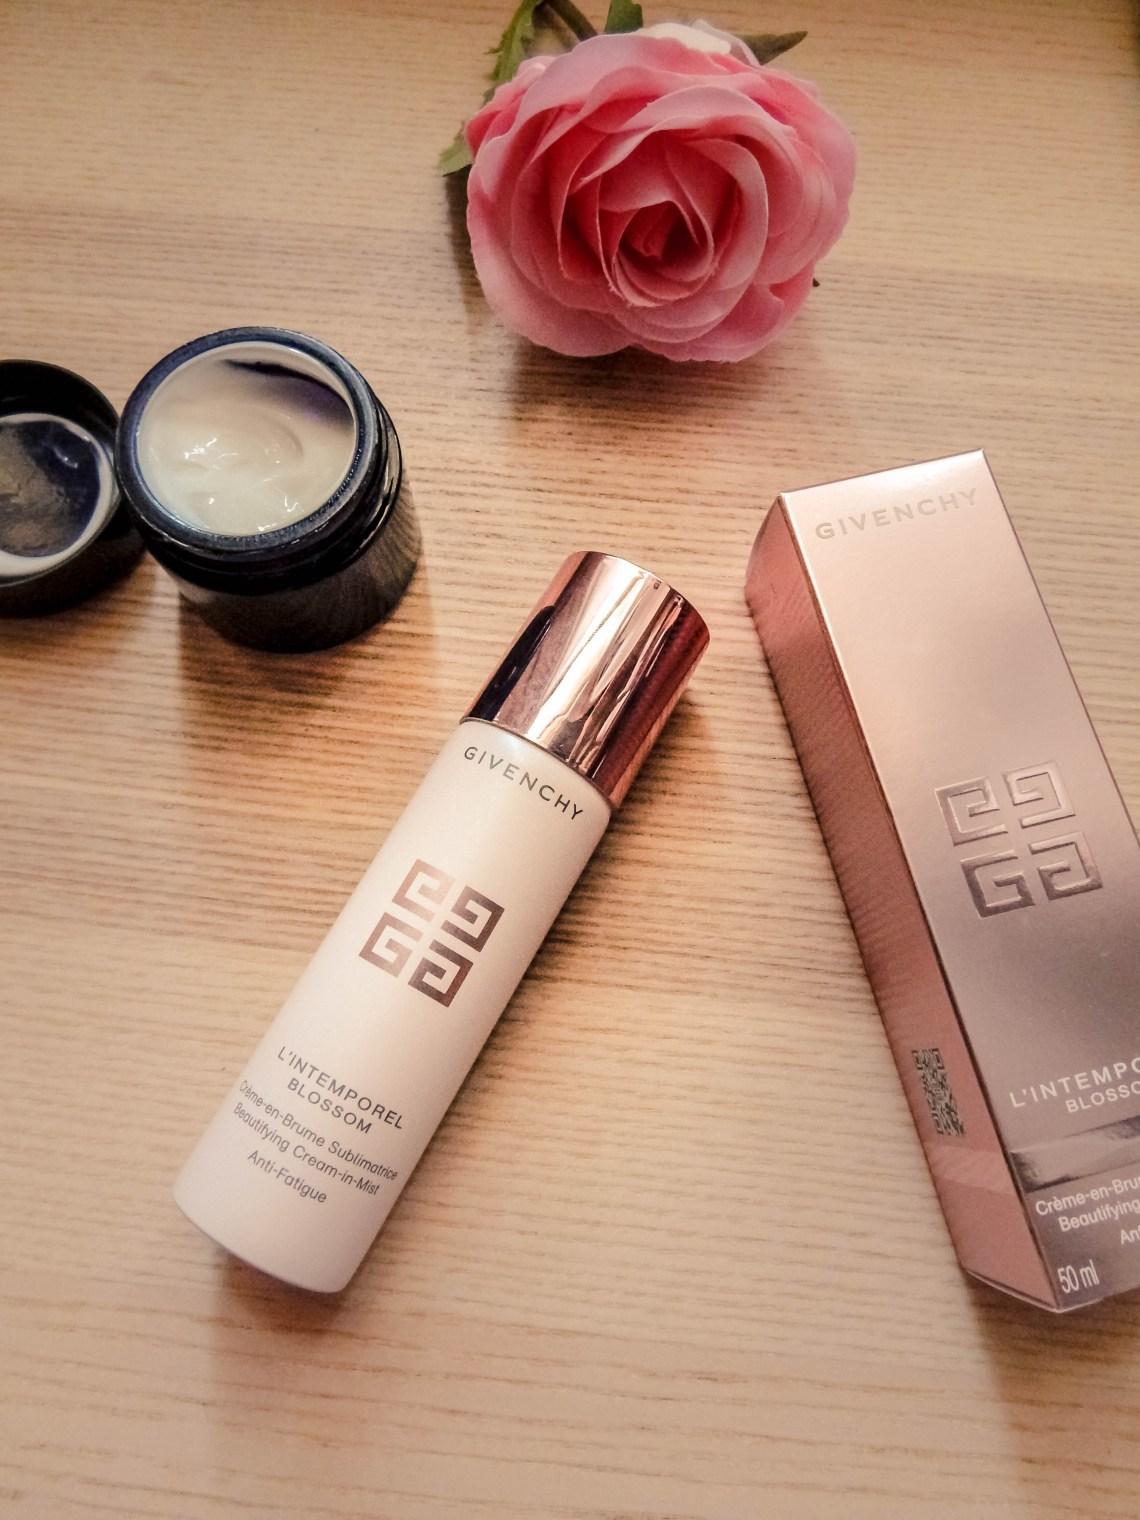 L'Intemporel Blossom Crème-en-Brume Sublimatrice Anti-Fatigue avis